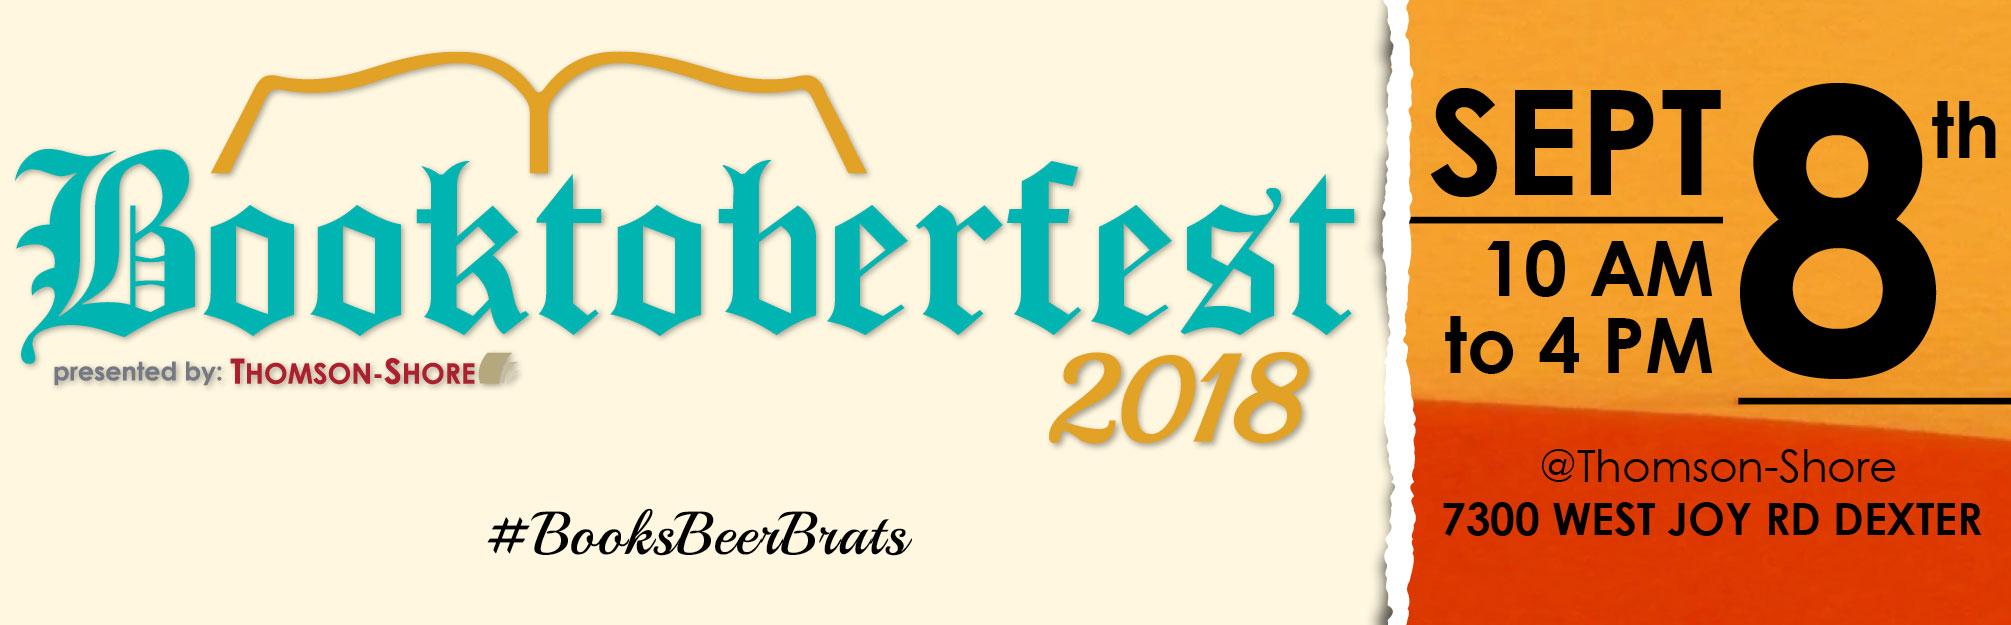 Booktoberfest September 8, 2018